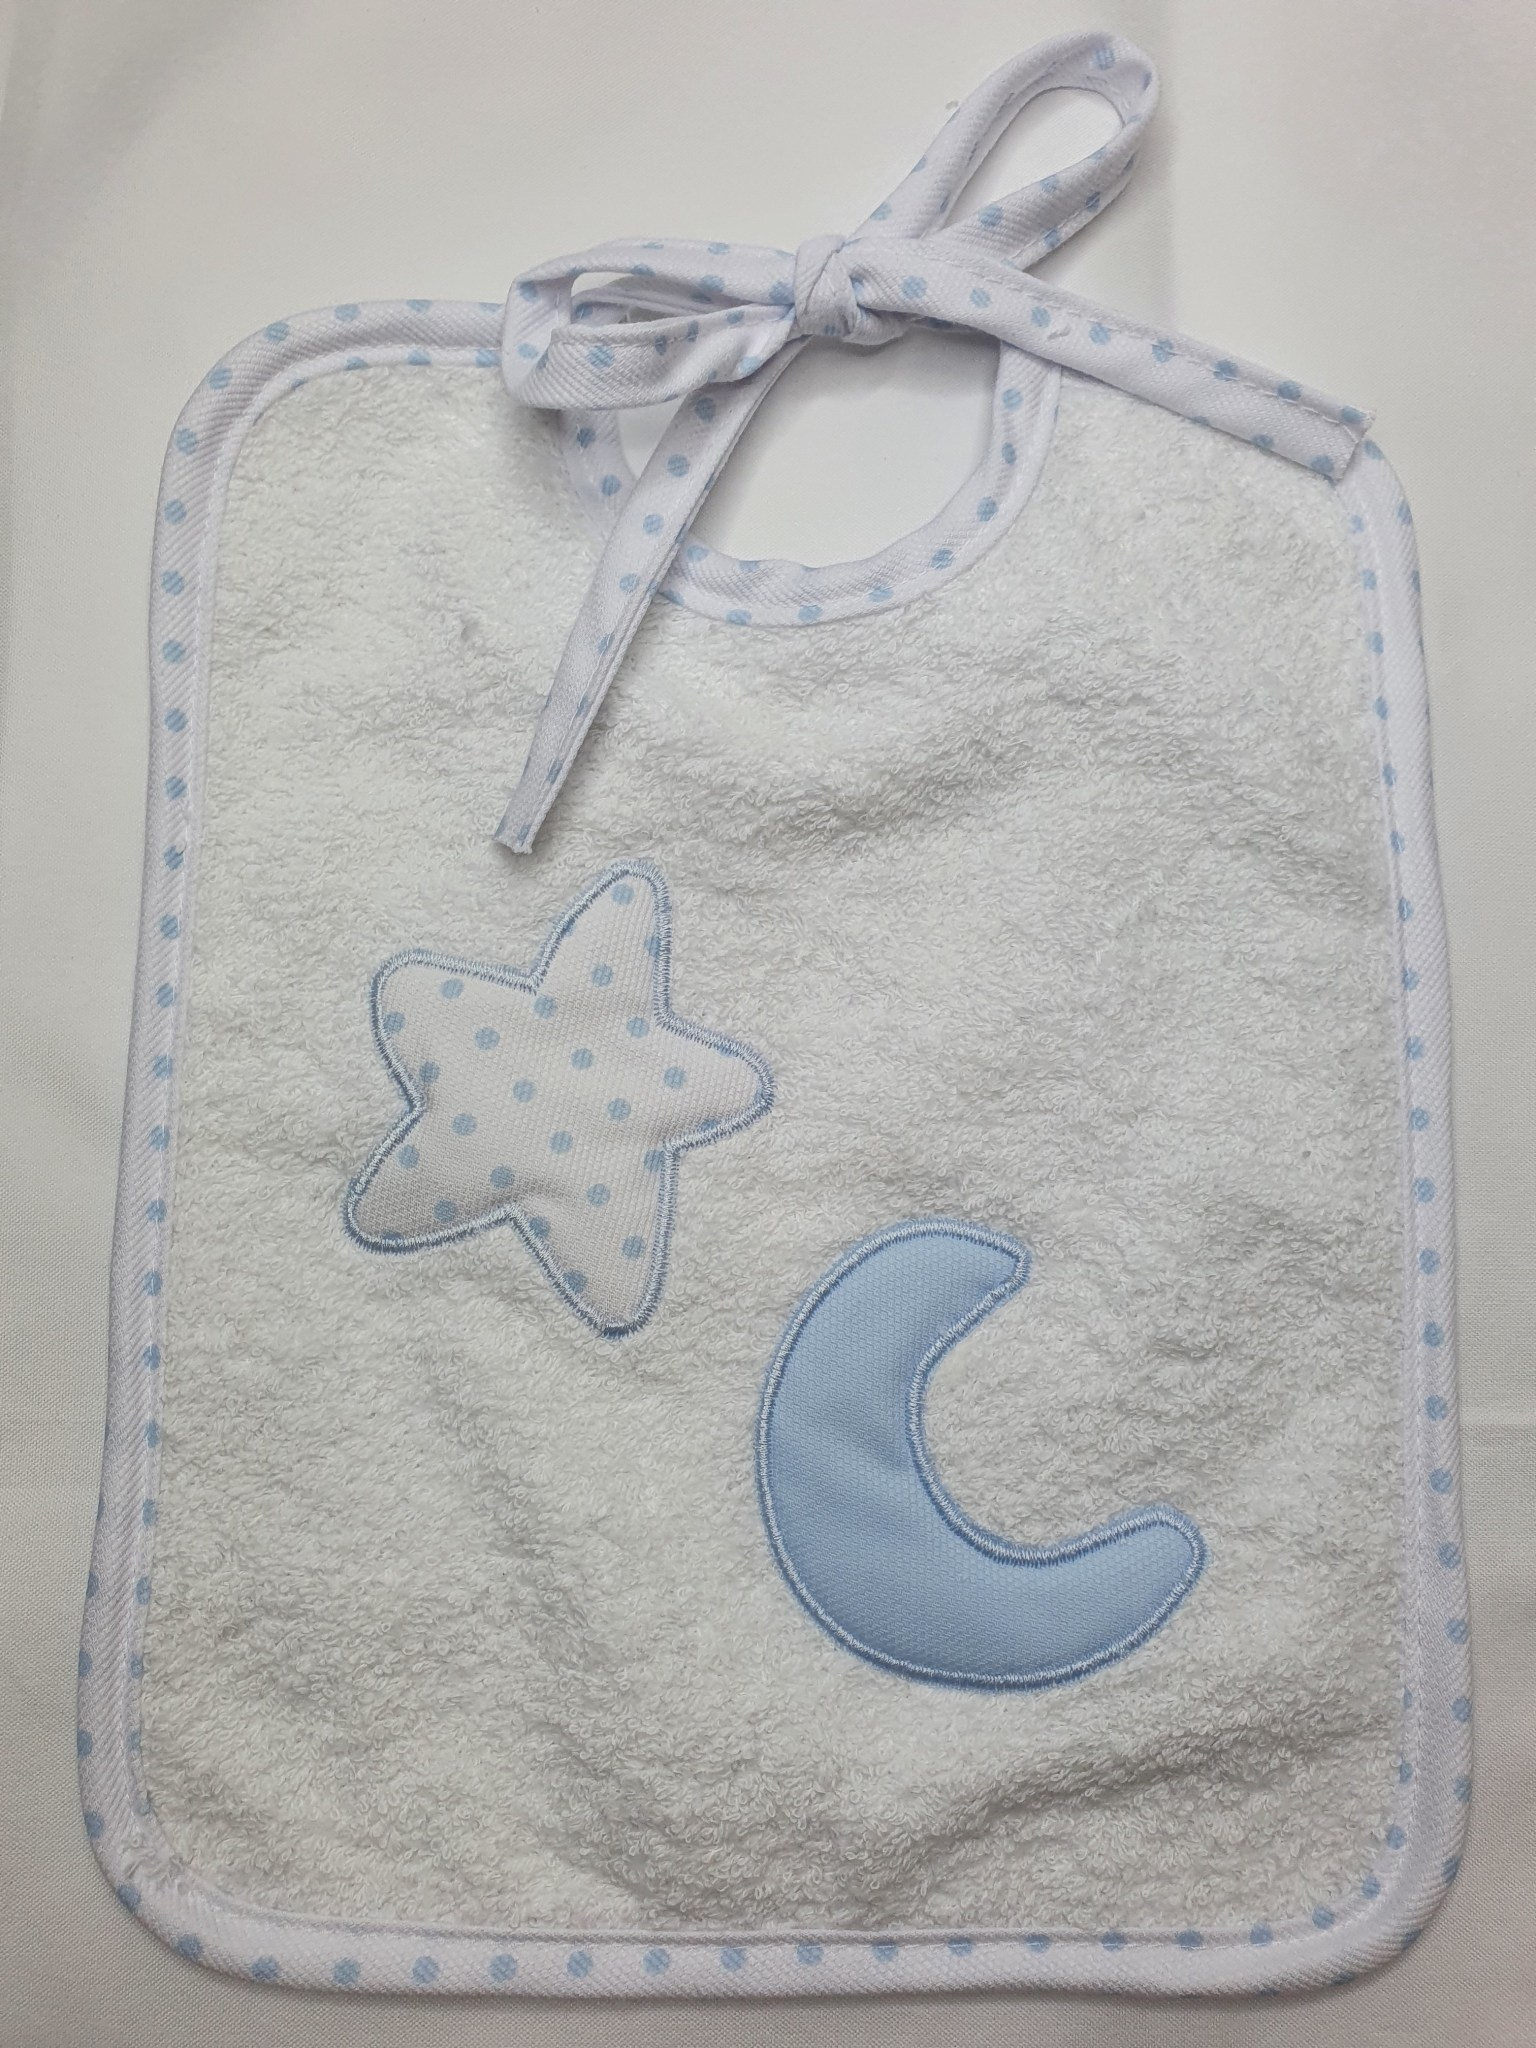 Babidu Babidu Square Blue/White Velcro Bib